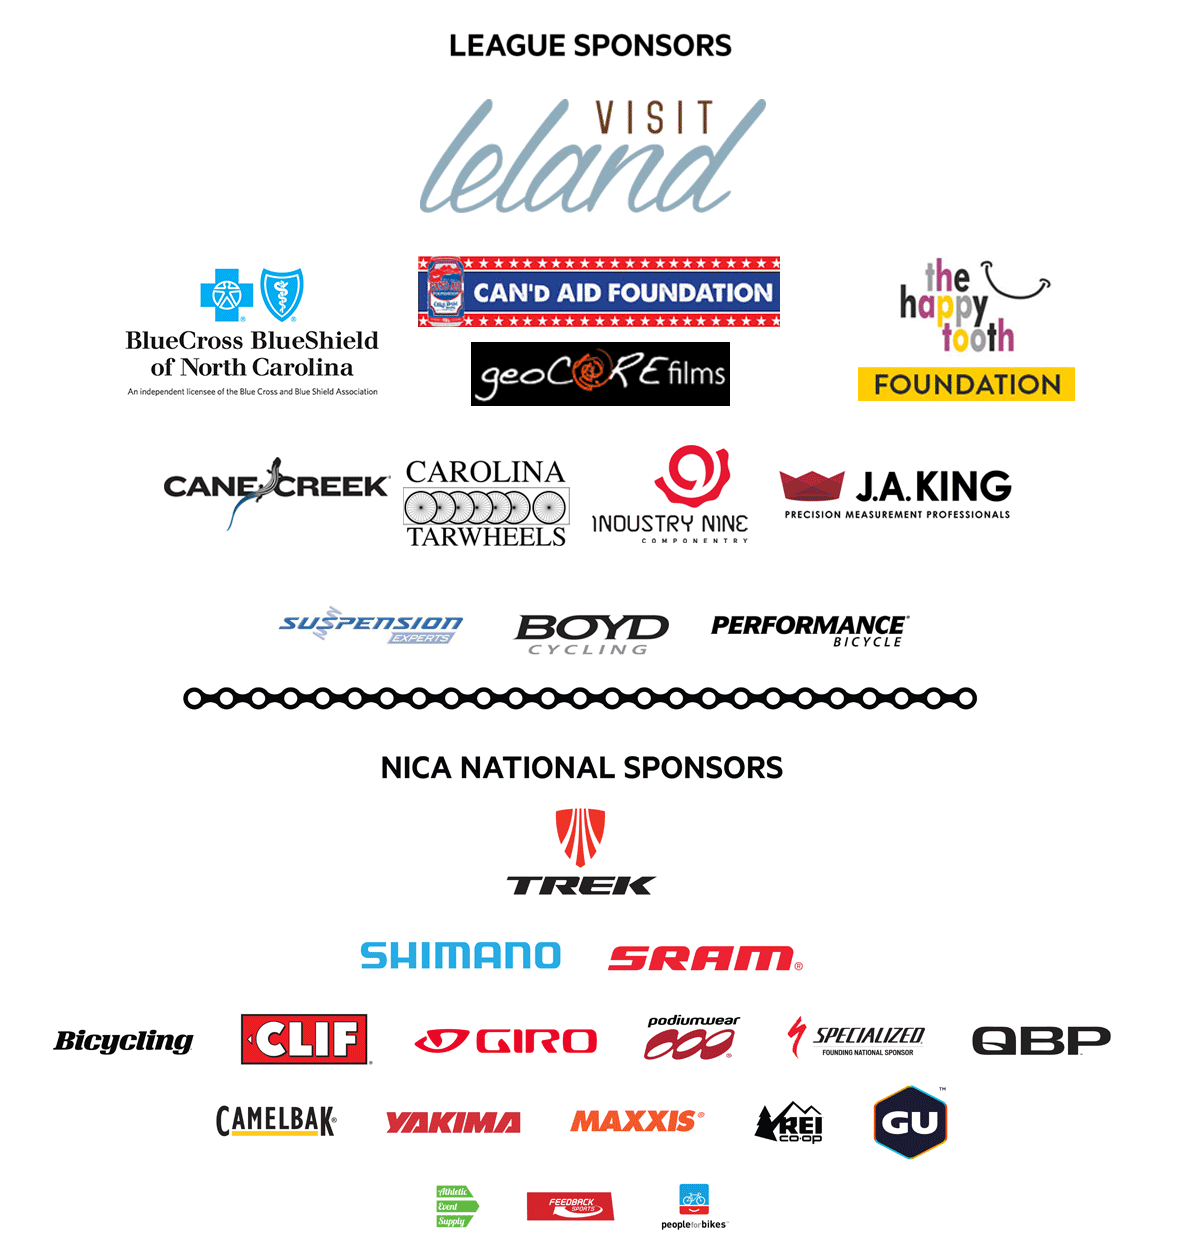 SponsorFooter 8 27 2017